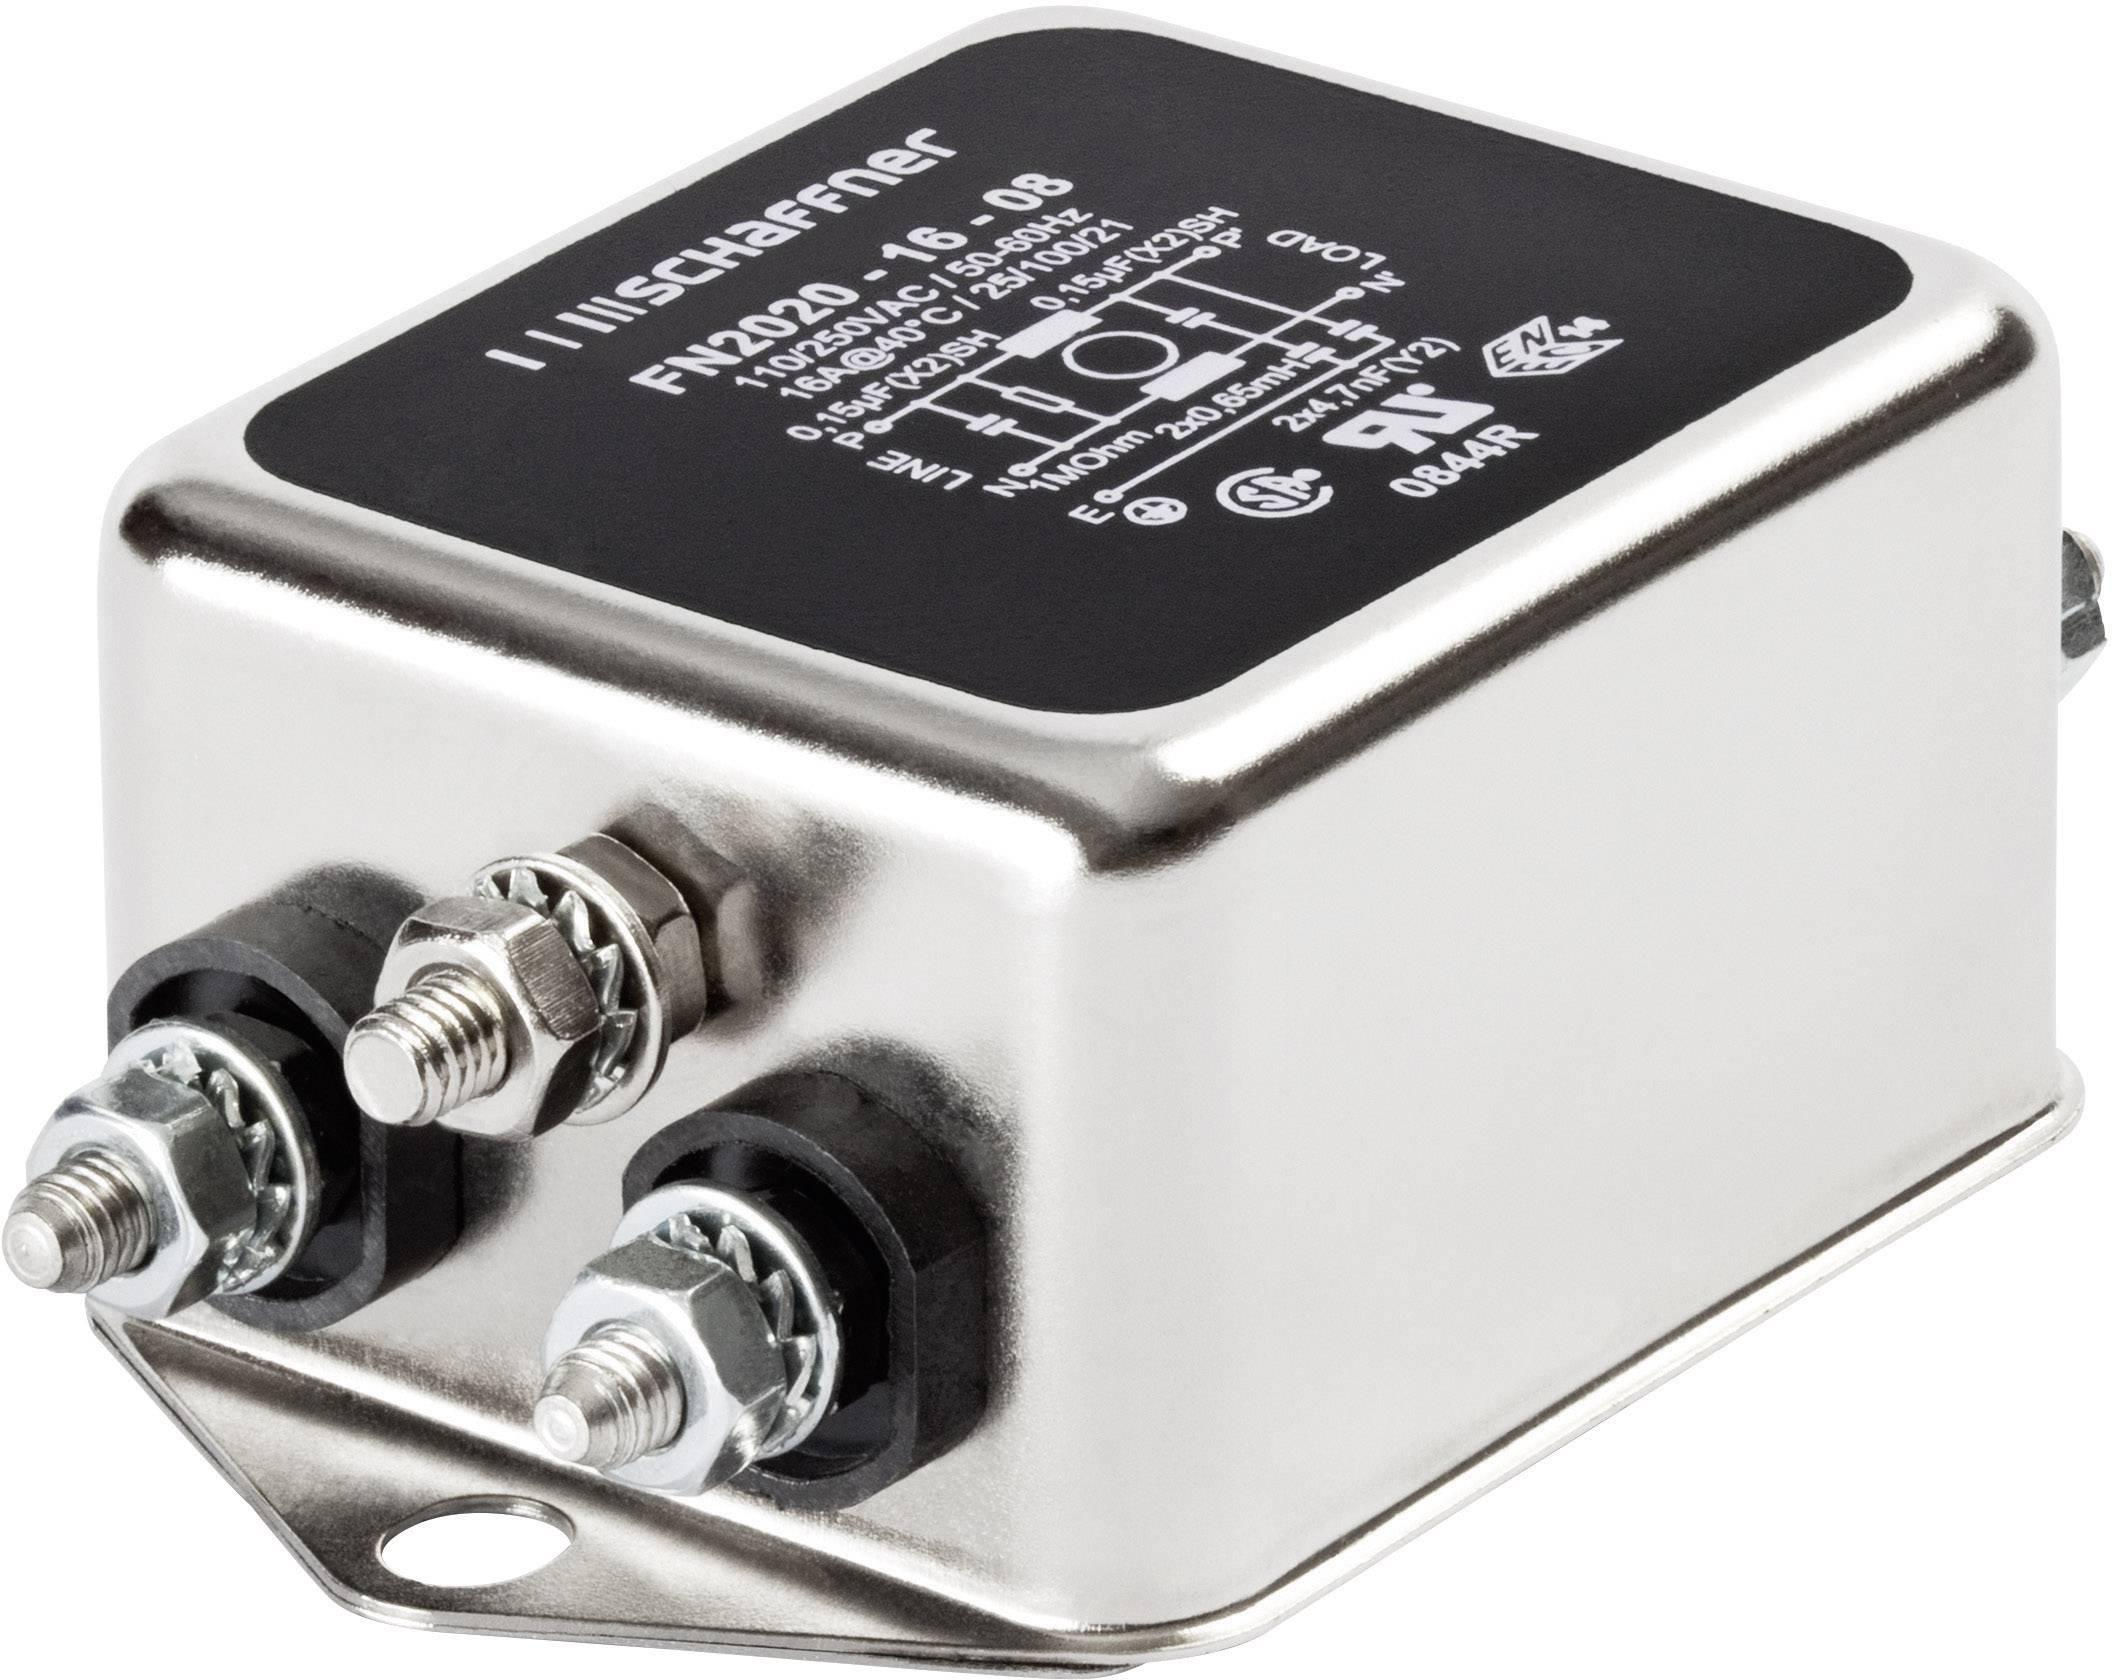 Síťový filtr Schaffner, FN 2020-1-06, 12 mH, 250 V/AC, 1 A